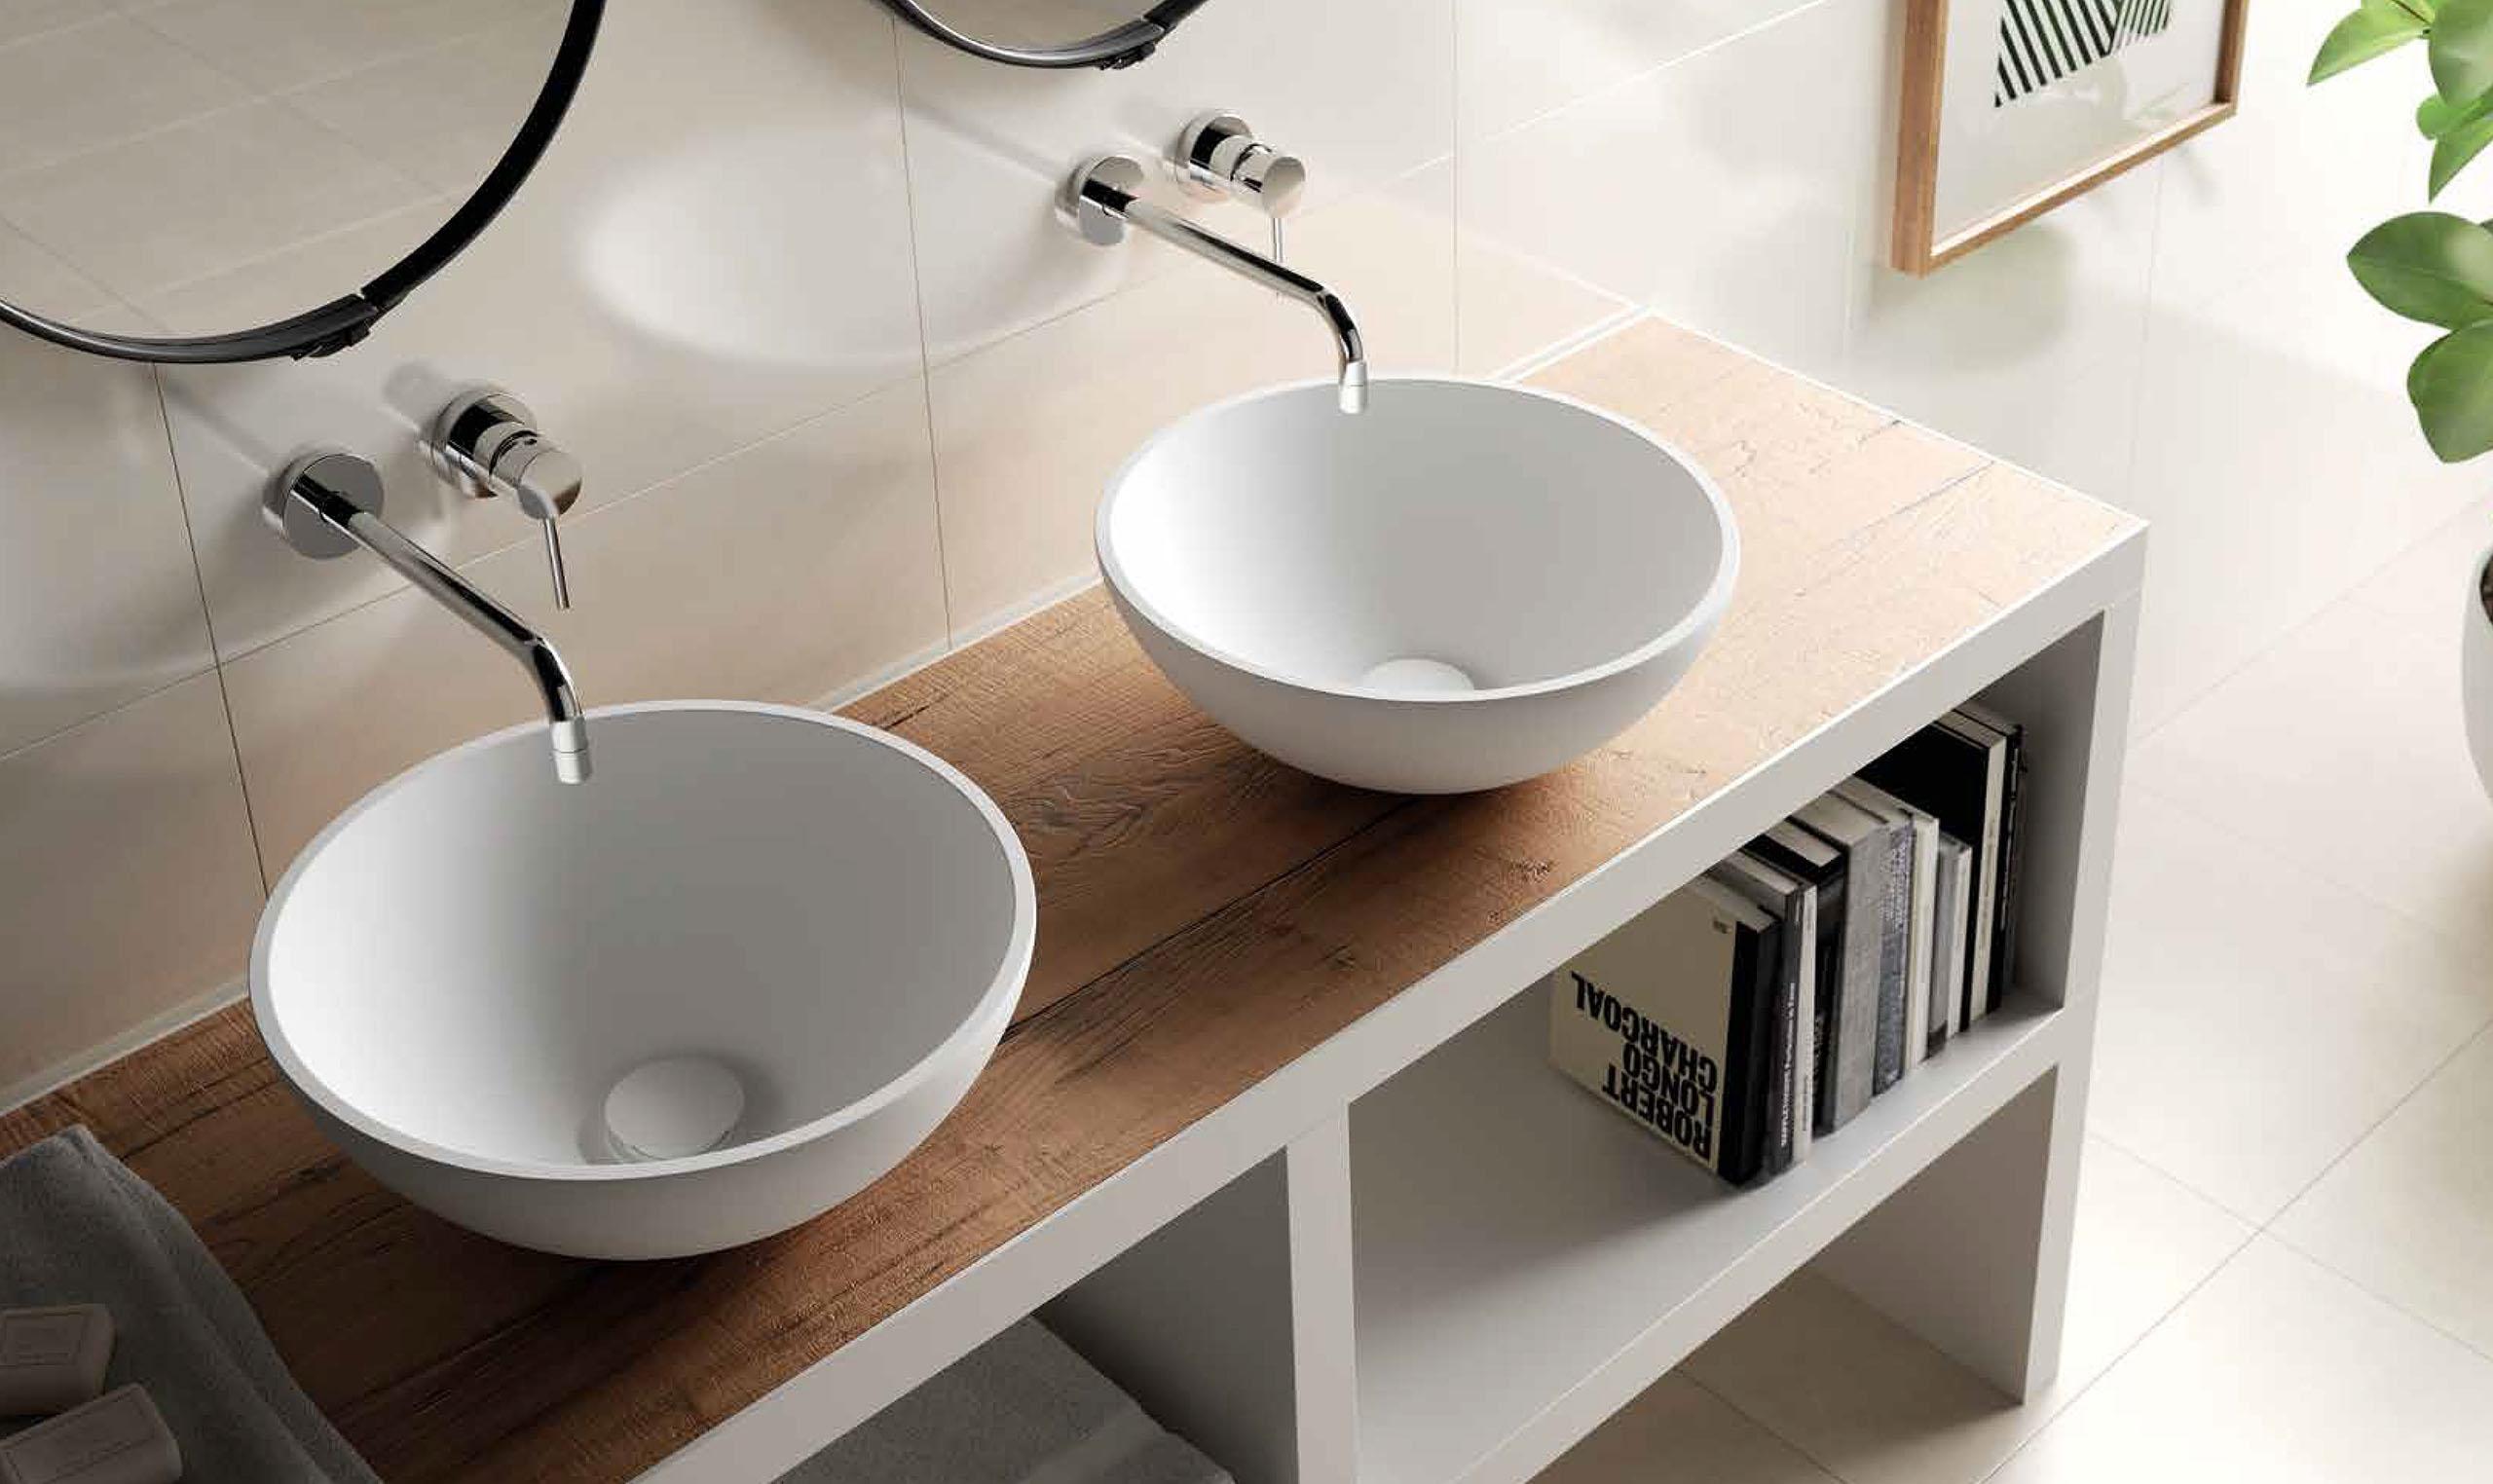 Solid surface waskom ovaal rvs regendouches rvs keukenkraan